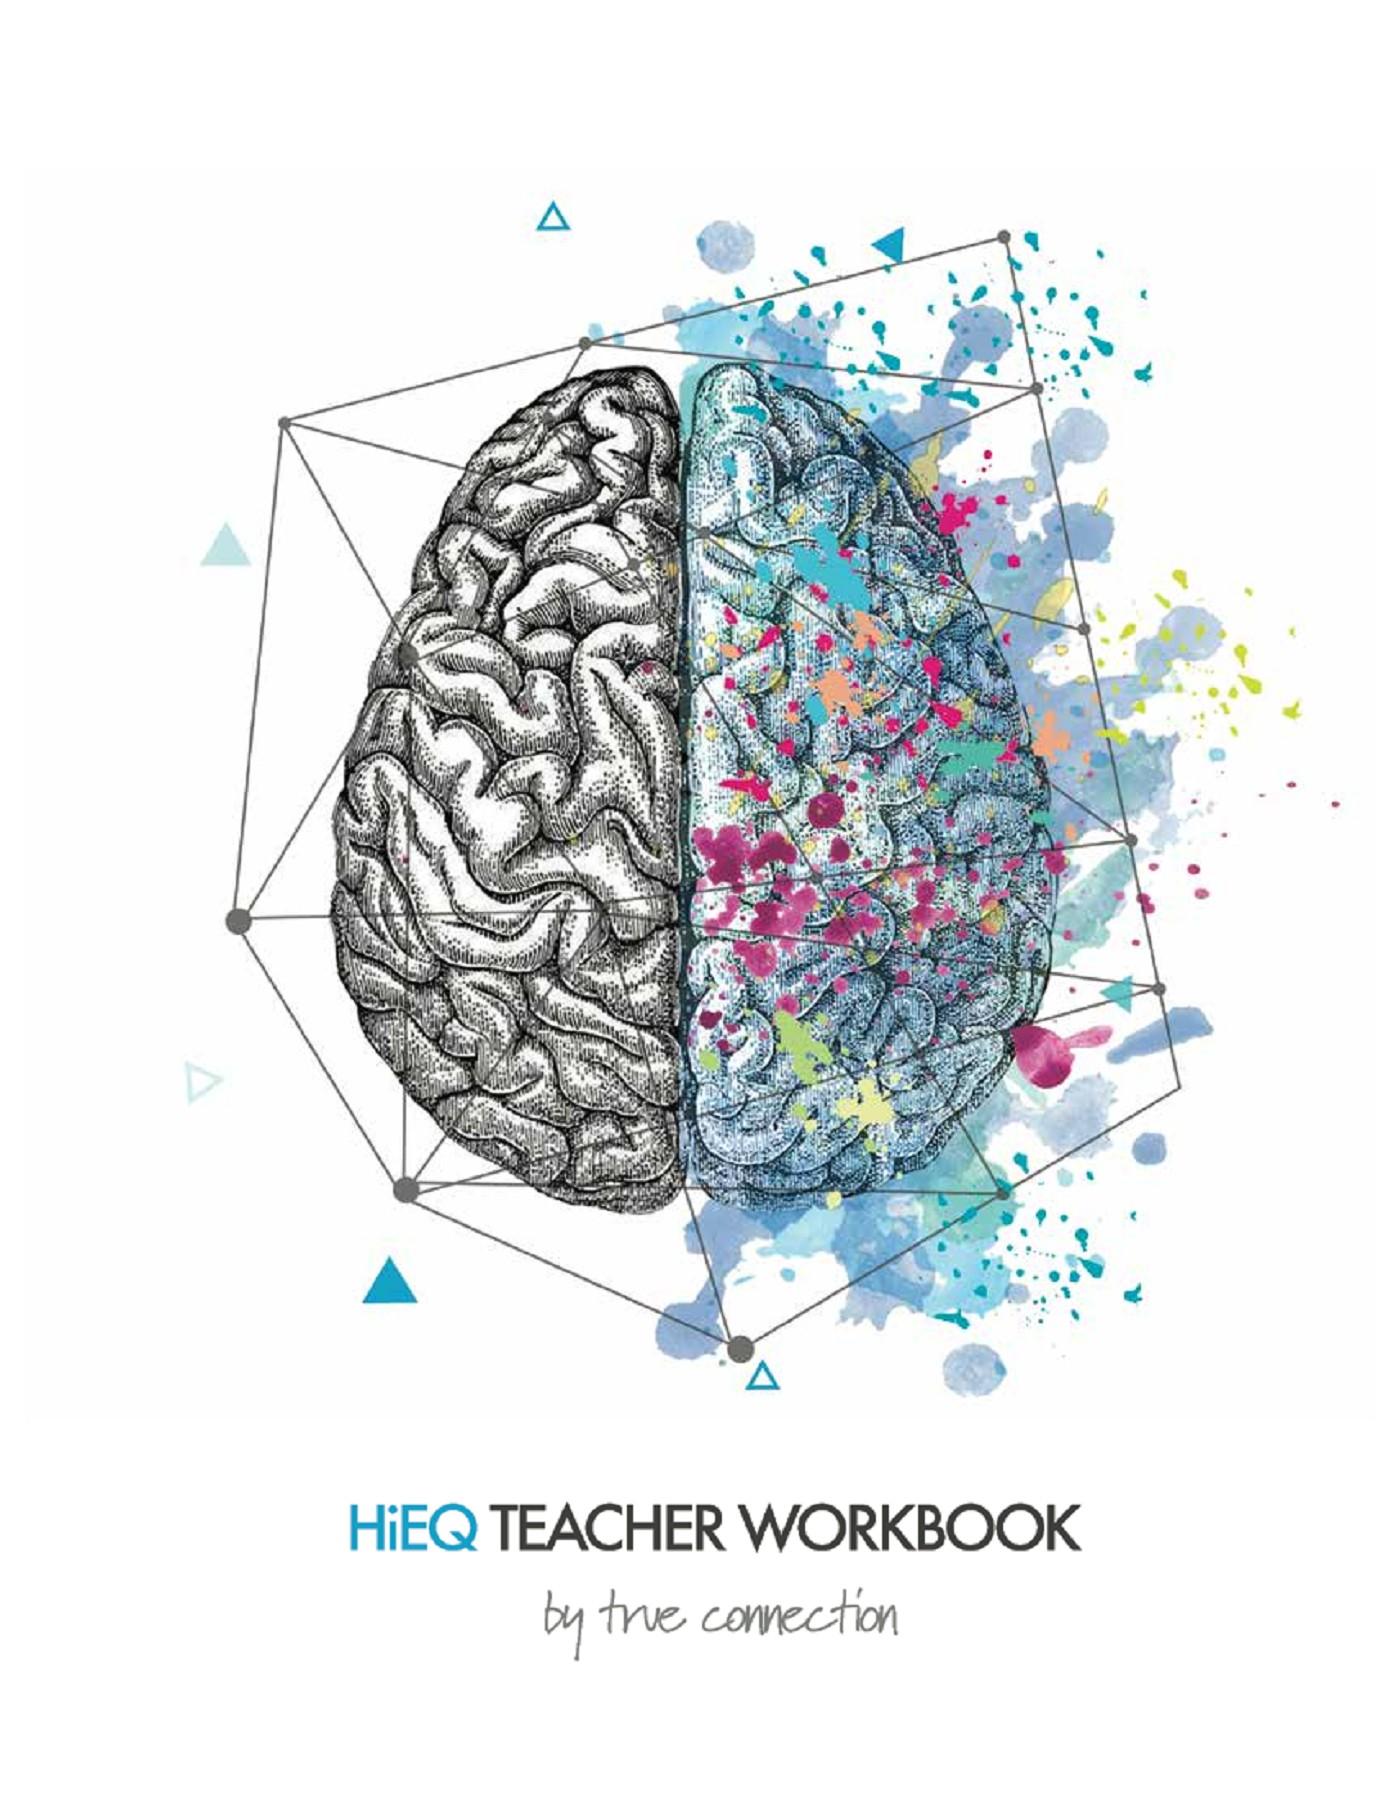 HiEQ Curriculum — True Connection